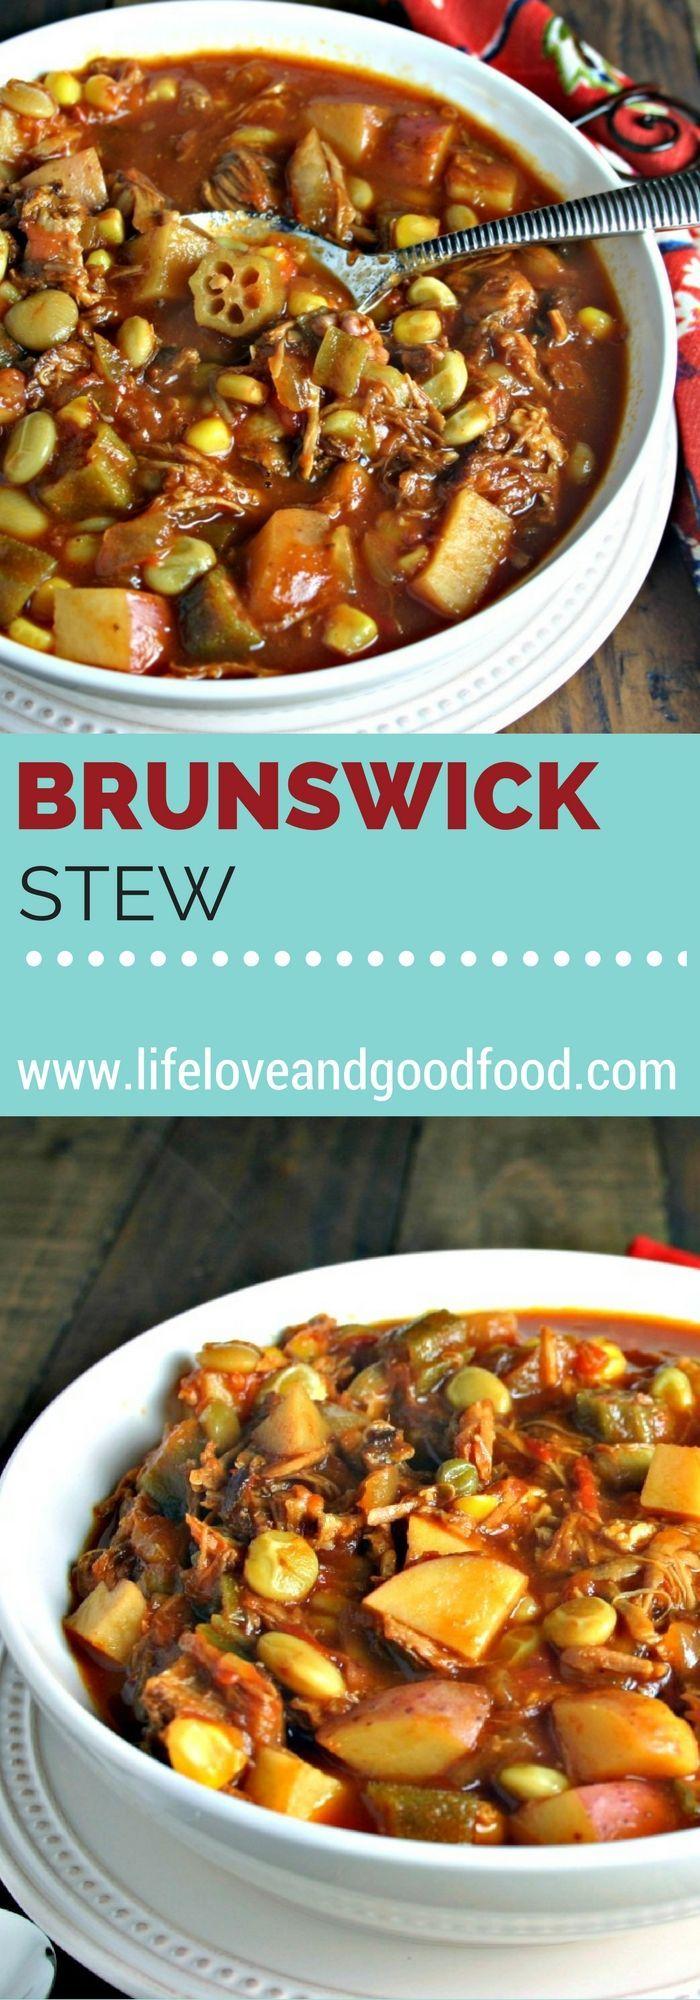 Easy Brunswick Stew   Life, Love, and Good Food: http://lifeloveandgoodfood.com/easy-brunswick-stew/